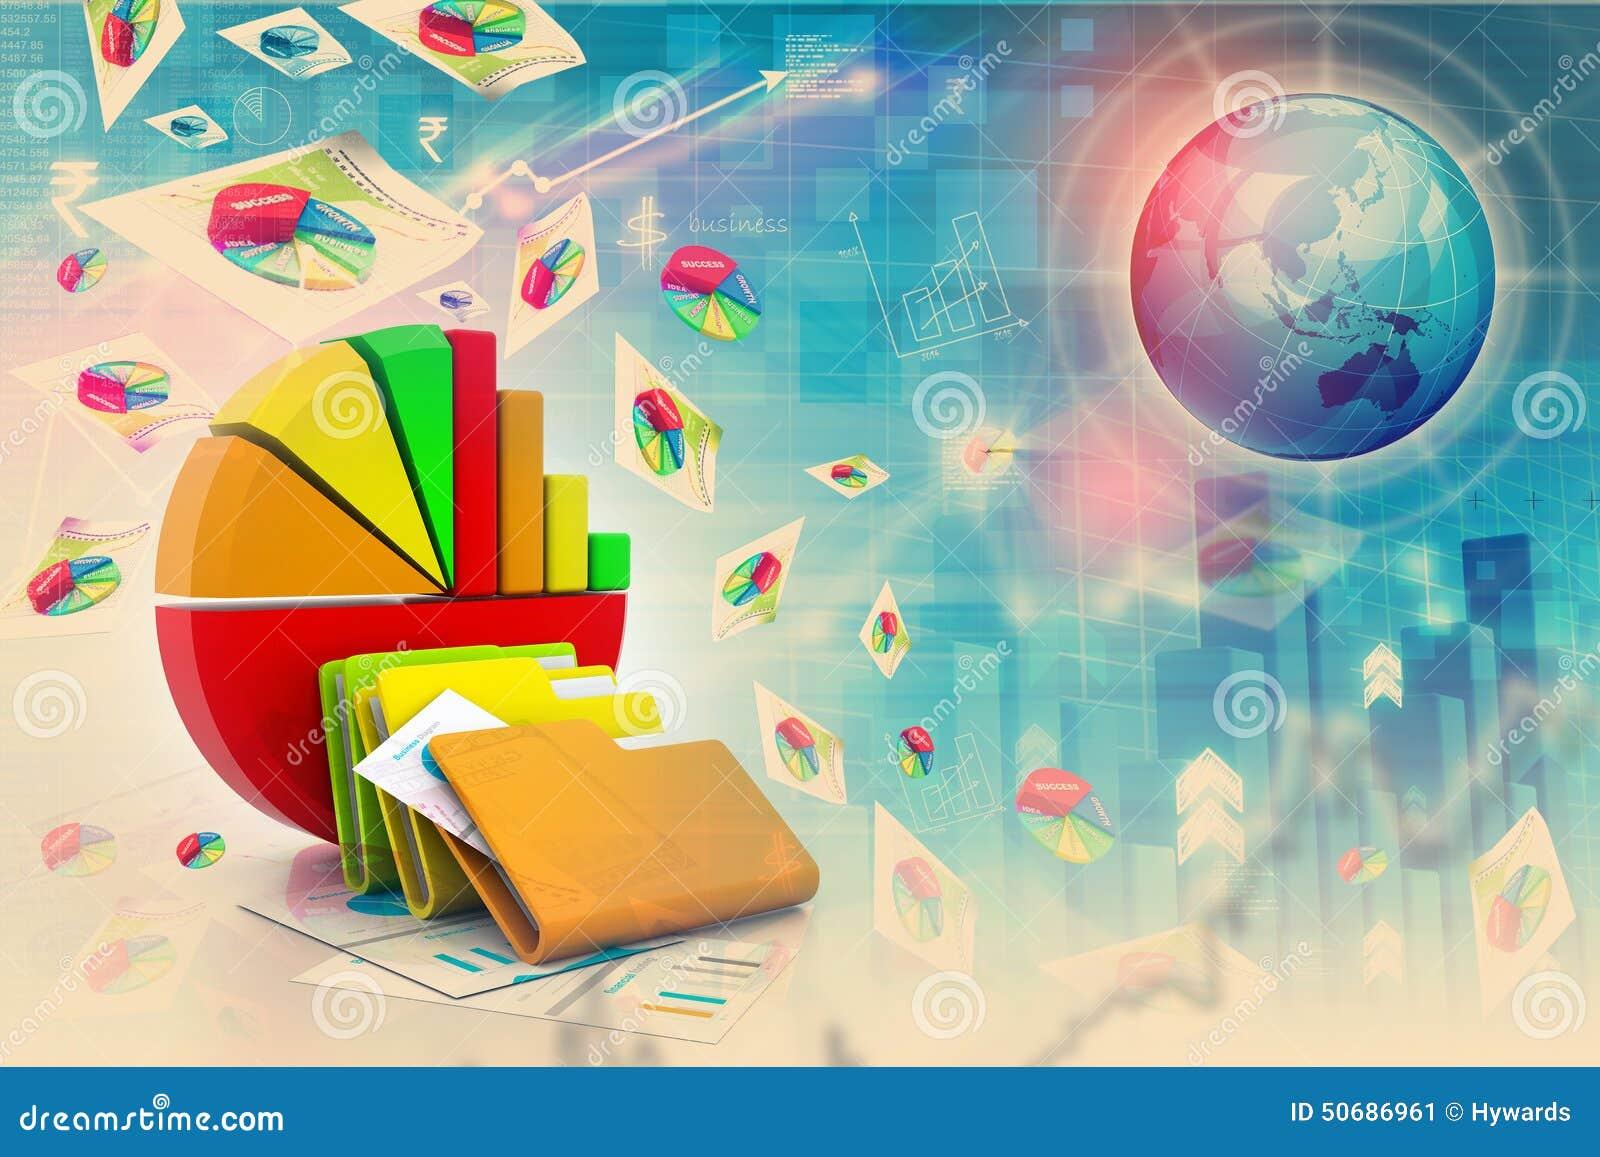 Download 企业图表图形 库存例证. 插画 包括有 经济, 管理, 投资, 收入, 胡言乱语的, 网络连接, 商务, 绘制 - 50686961